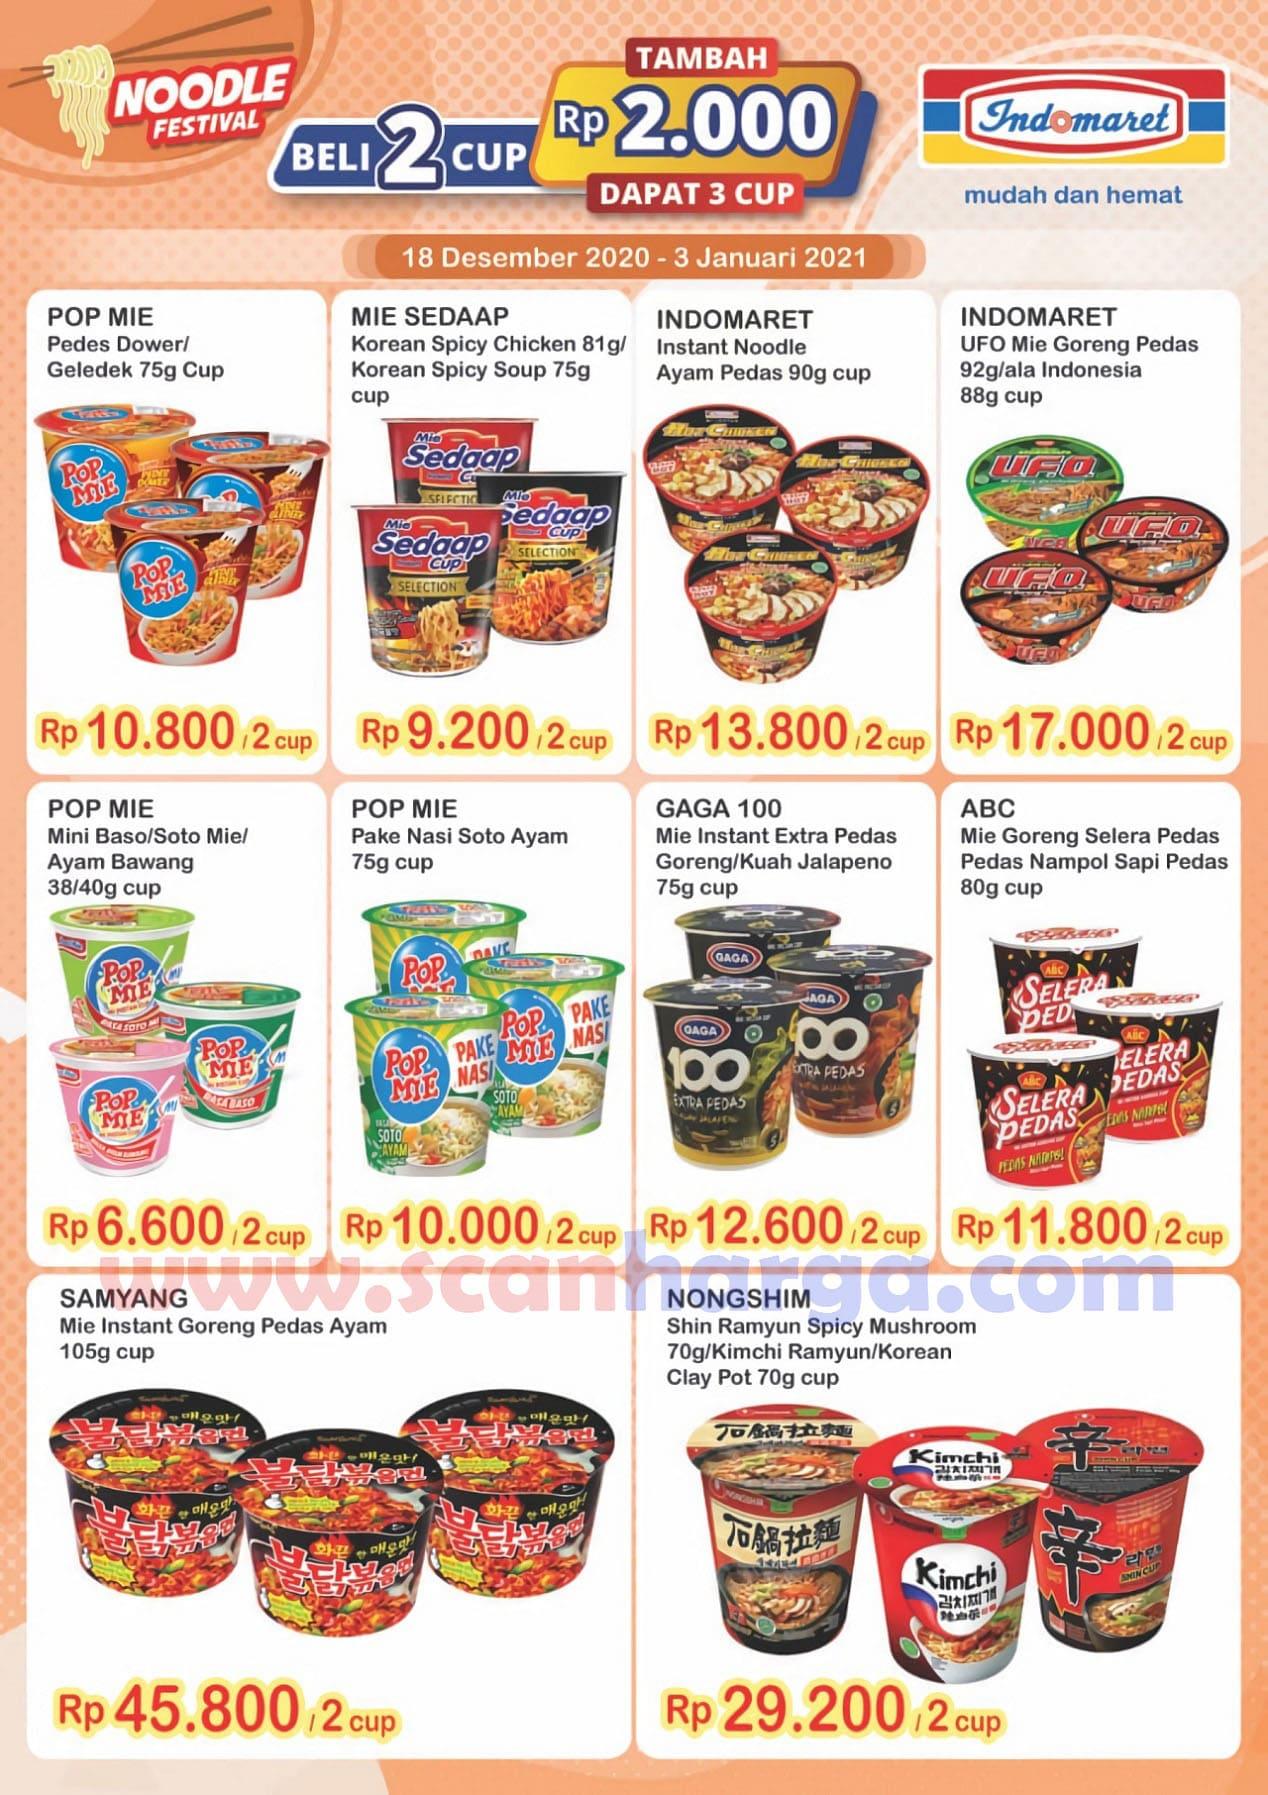 Promo Indomaret Tambah Rp.2.000 Dapat 3 PCS [18 Desember 2020 - 3 Januari 2021]